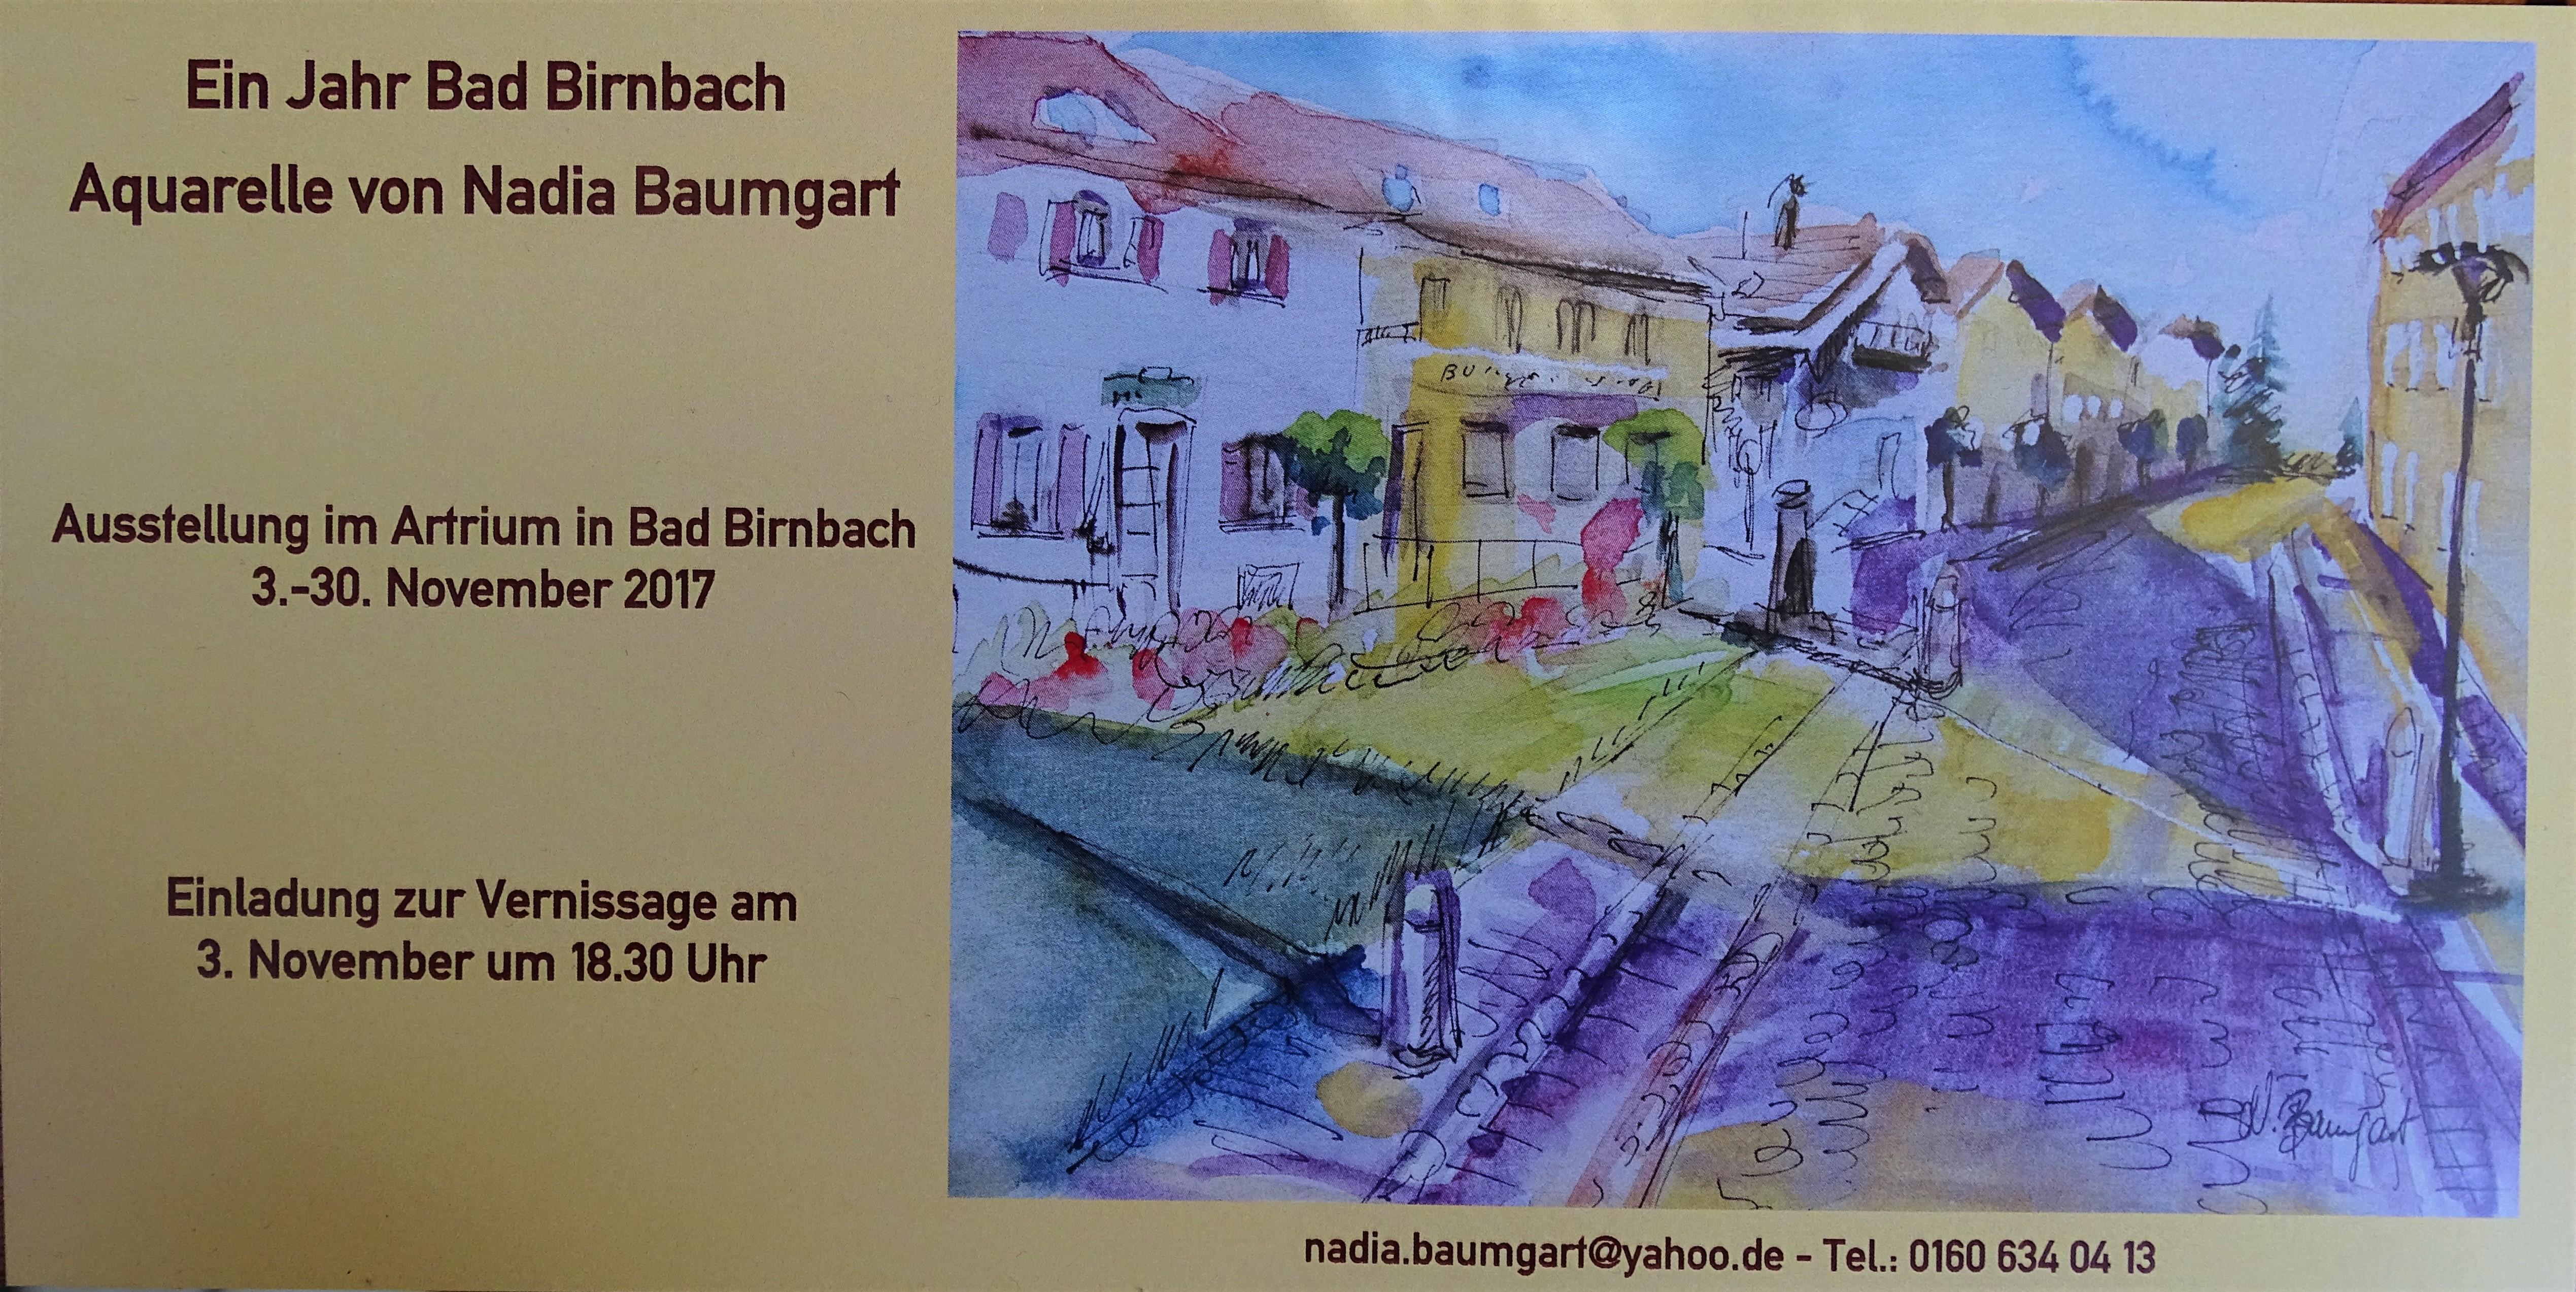 Aquarelle Nadia Baumgart Bad Birnbach